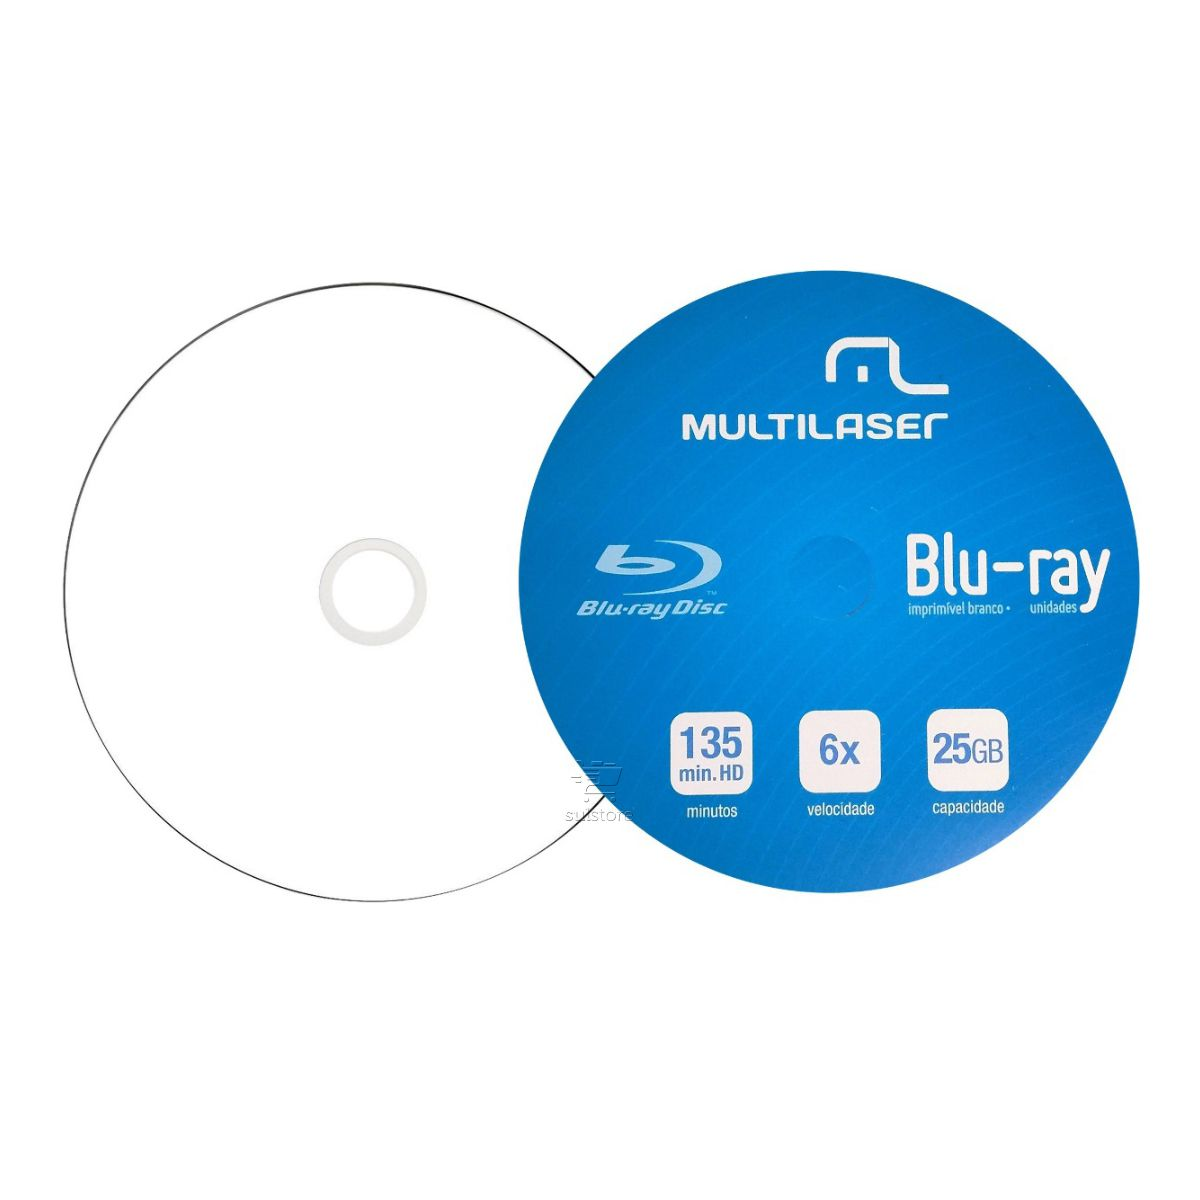 Kit Gravador Leitor Asus SBW-06D2X-U e Mídias Virgens DVD/CD Bluray Multilaser